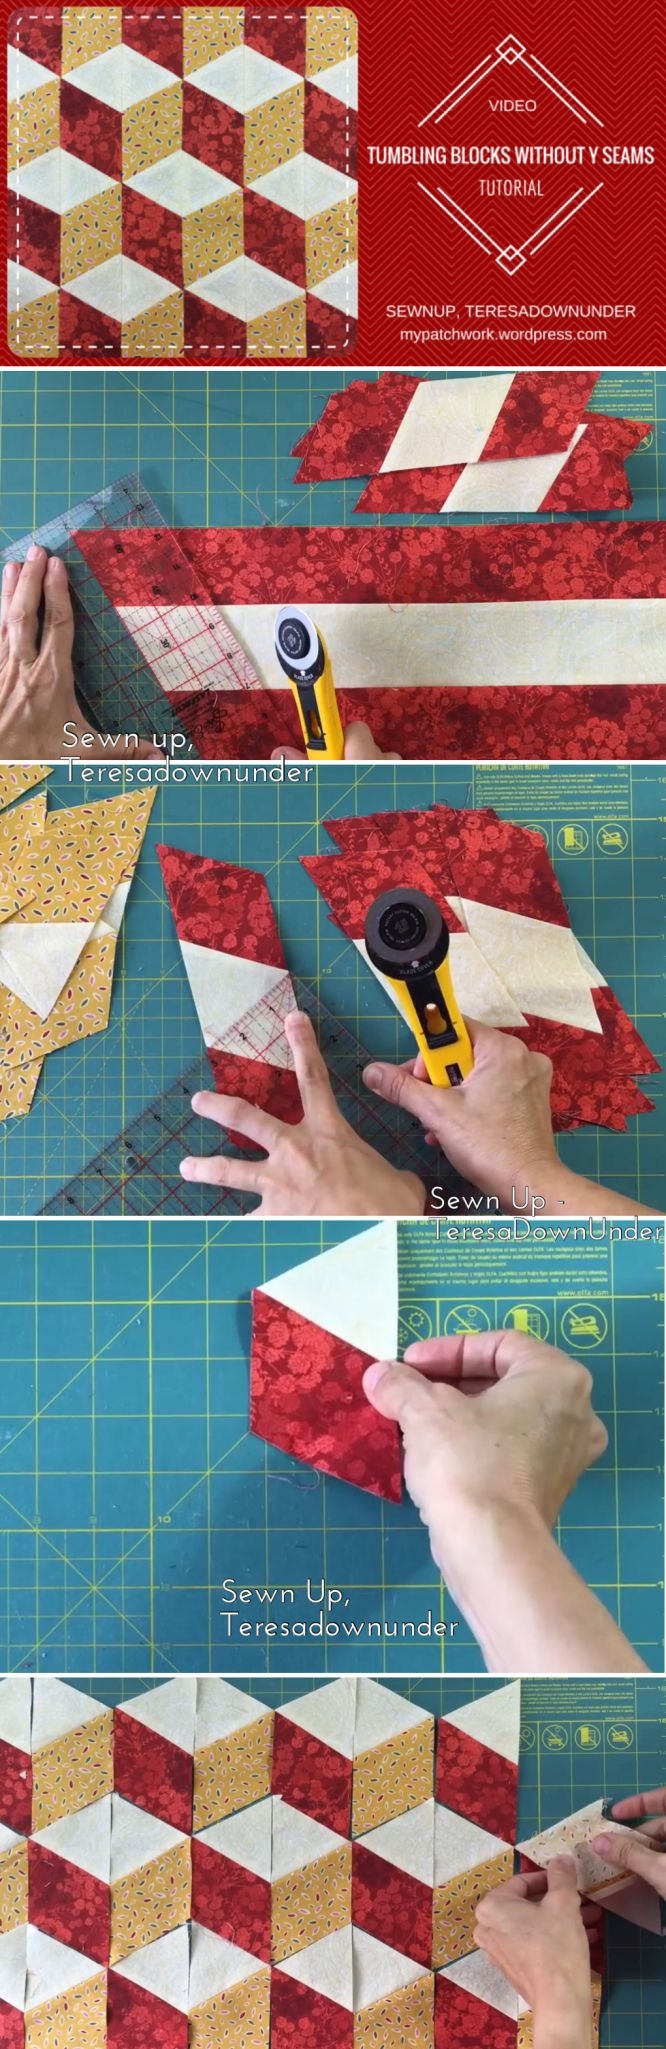 Video tutorial: tumbling blocks with no Y seams | Quilts